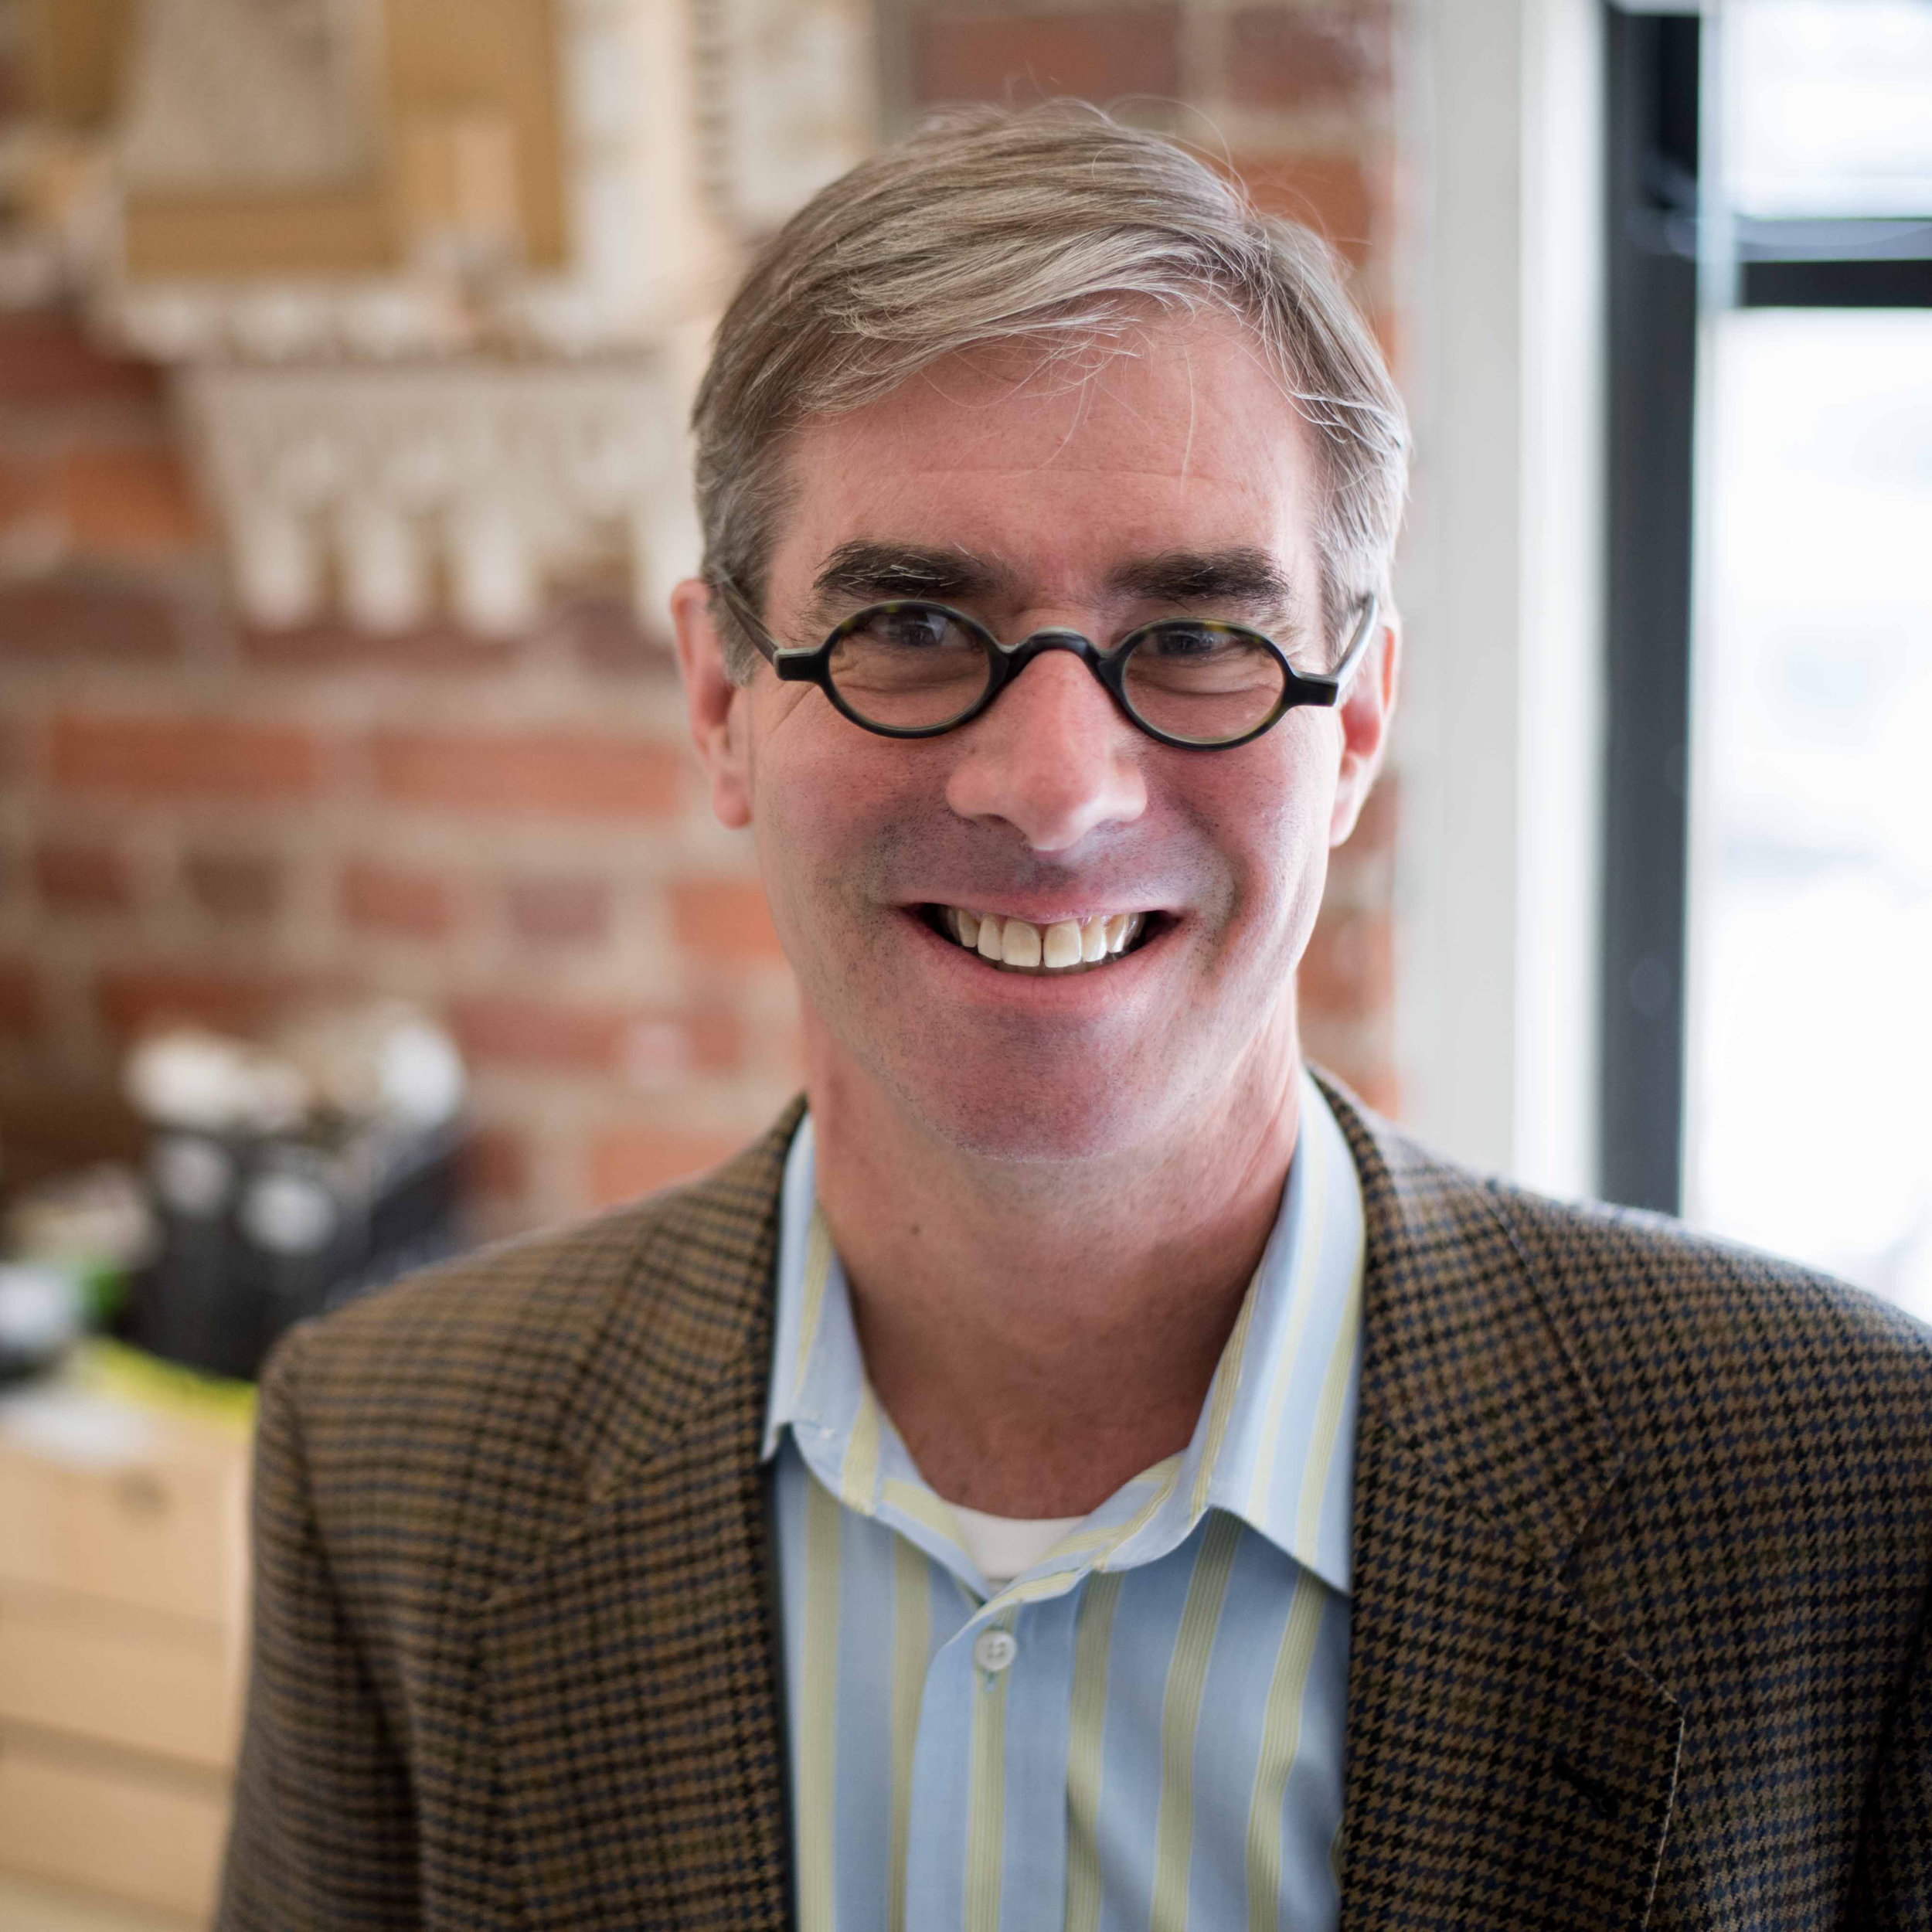 Christopher Logan, AIA | Associate -